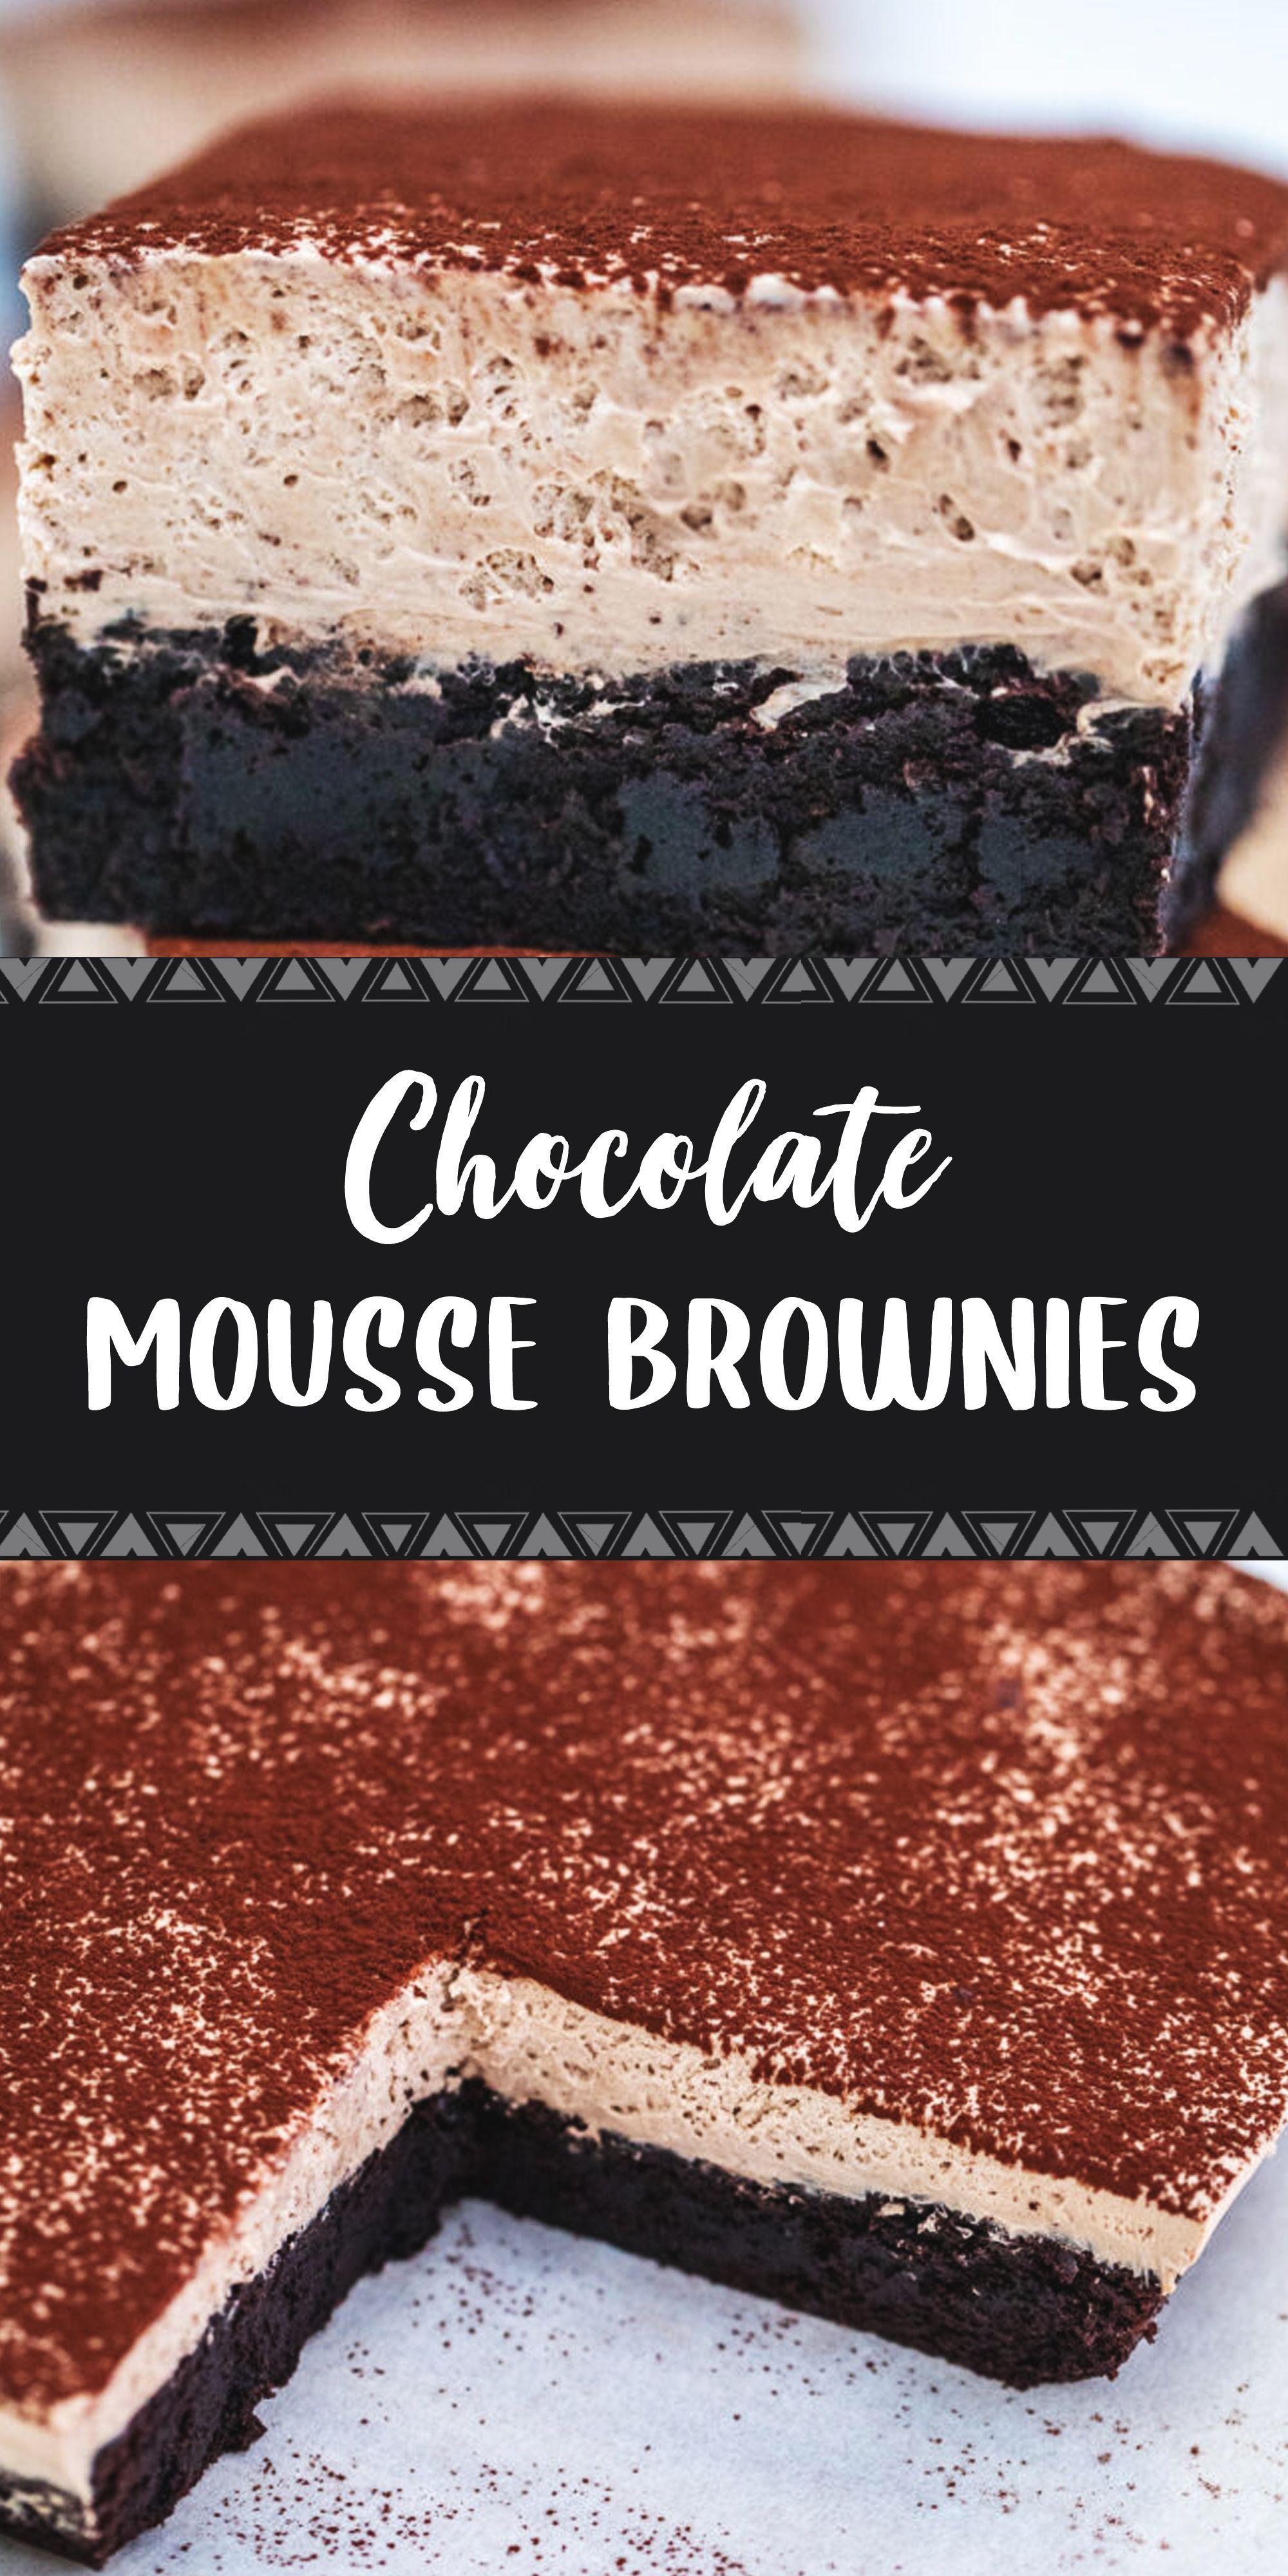 Chocolate mousse brownies or best brownies ever in 2020